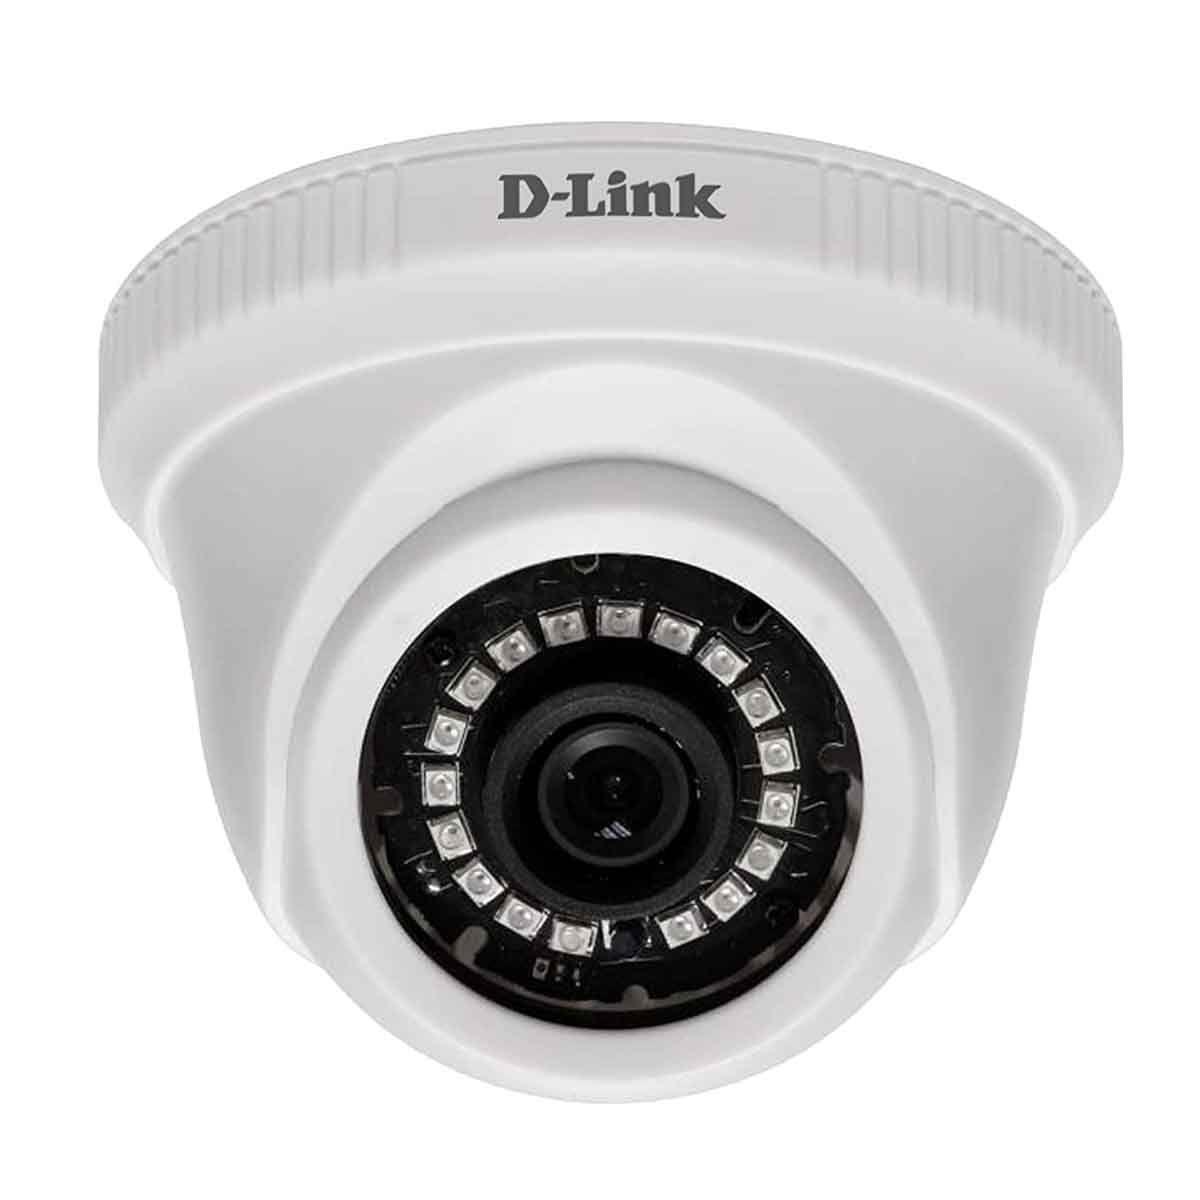 D-Link 2 MP Full HD Dome Camera